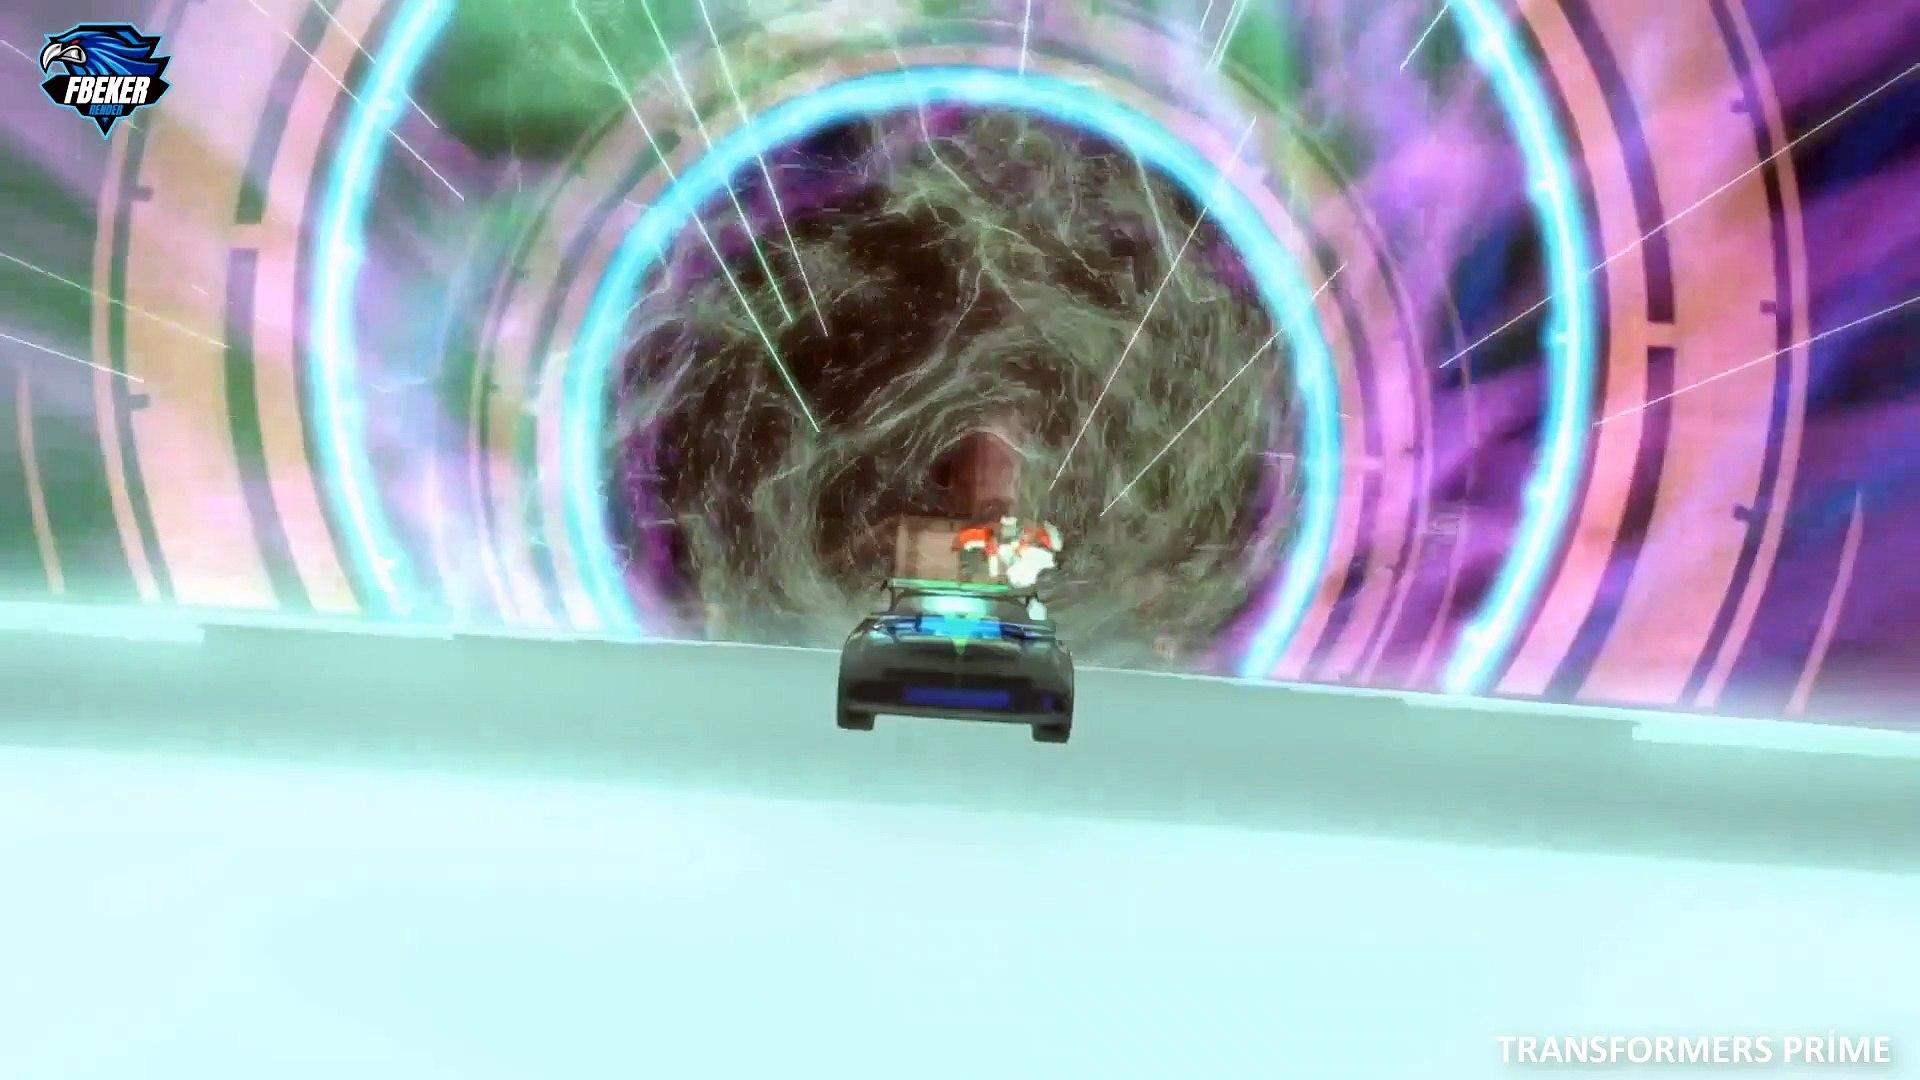 Transformers Prime 28.Bölüm Orion Pax Kısım 2 Full Hd